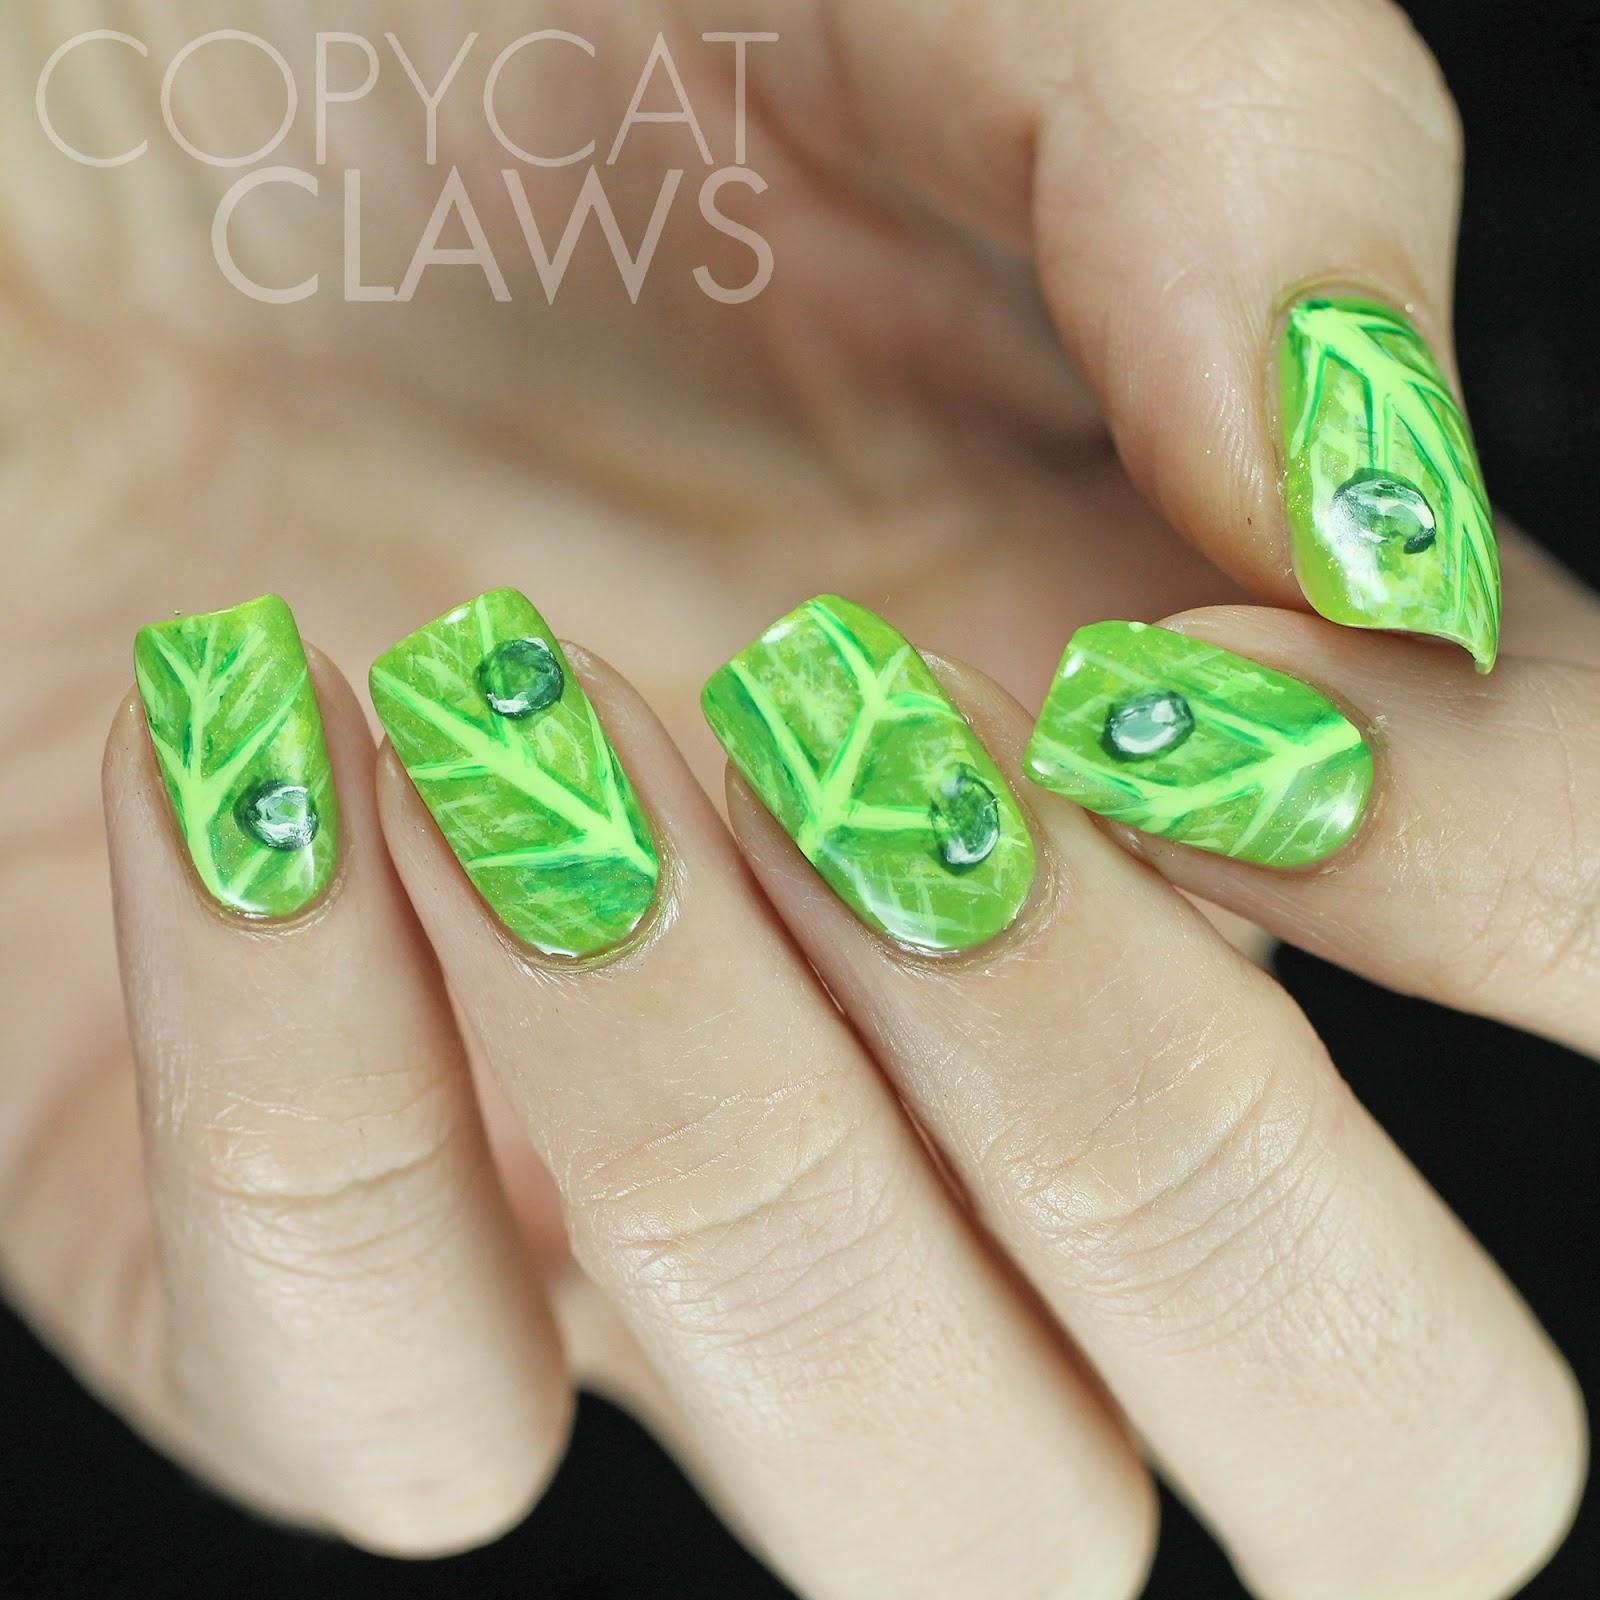 Copycat Claws The Digit Al Dozen Does Nature Day 4 Leaf Nail Art